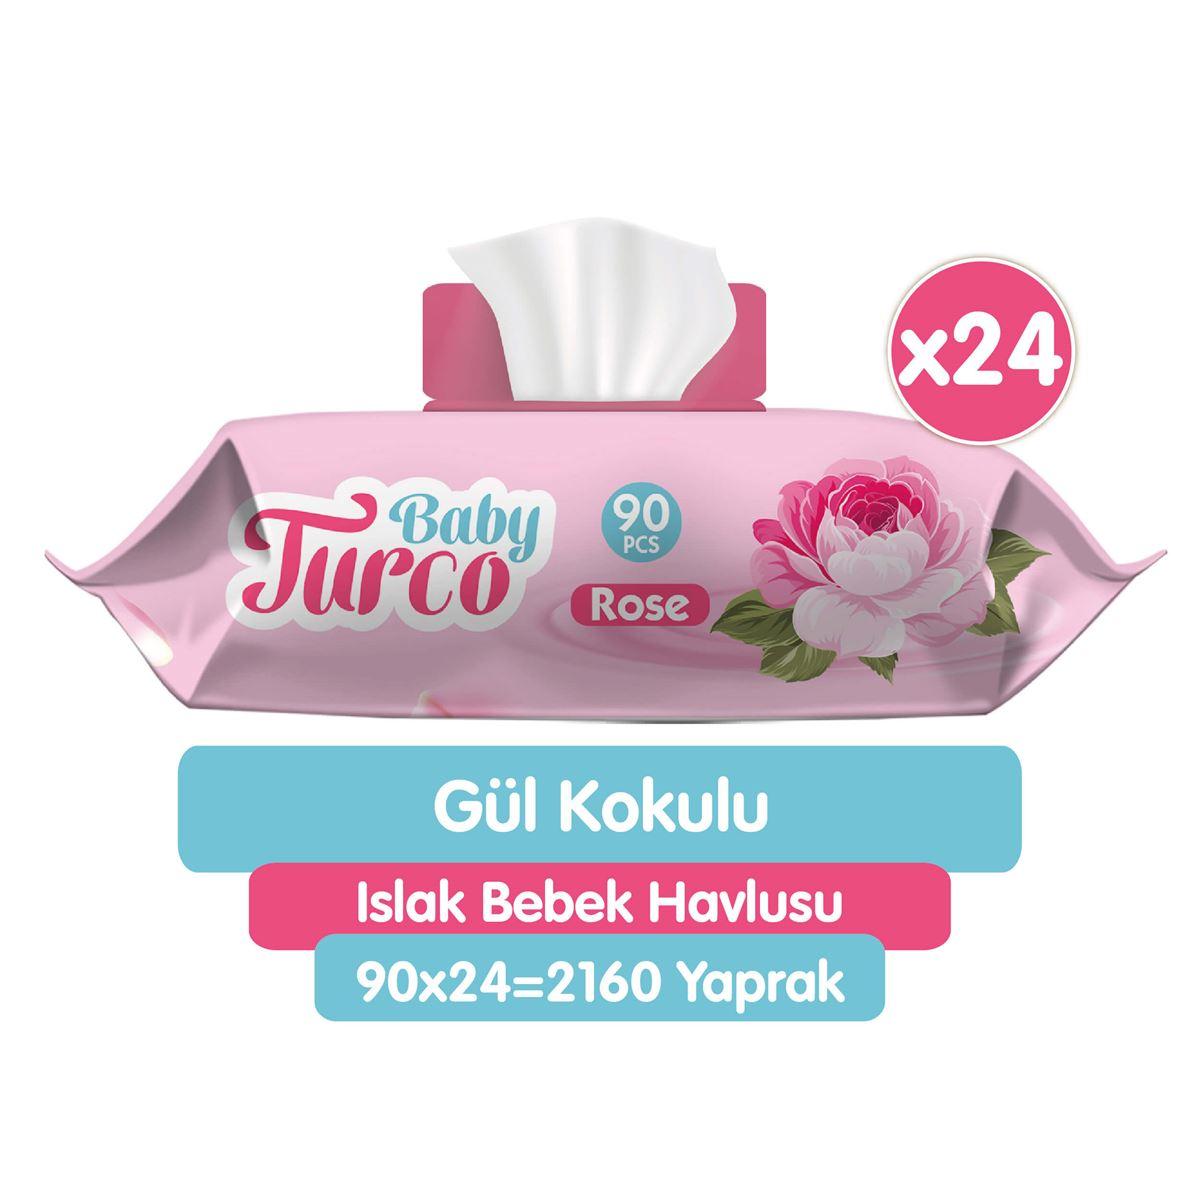 Baby Turco Gül Kokulu Islak Bebek Havlusu 24x90 Adet